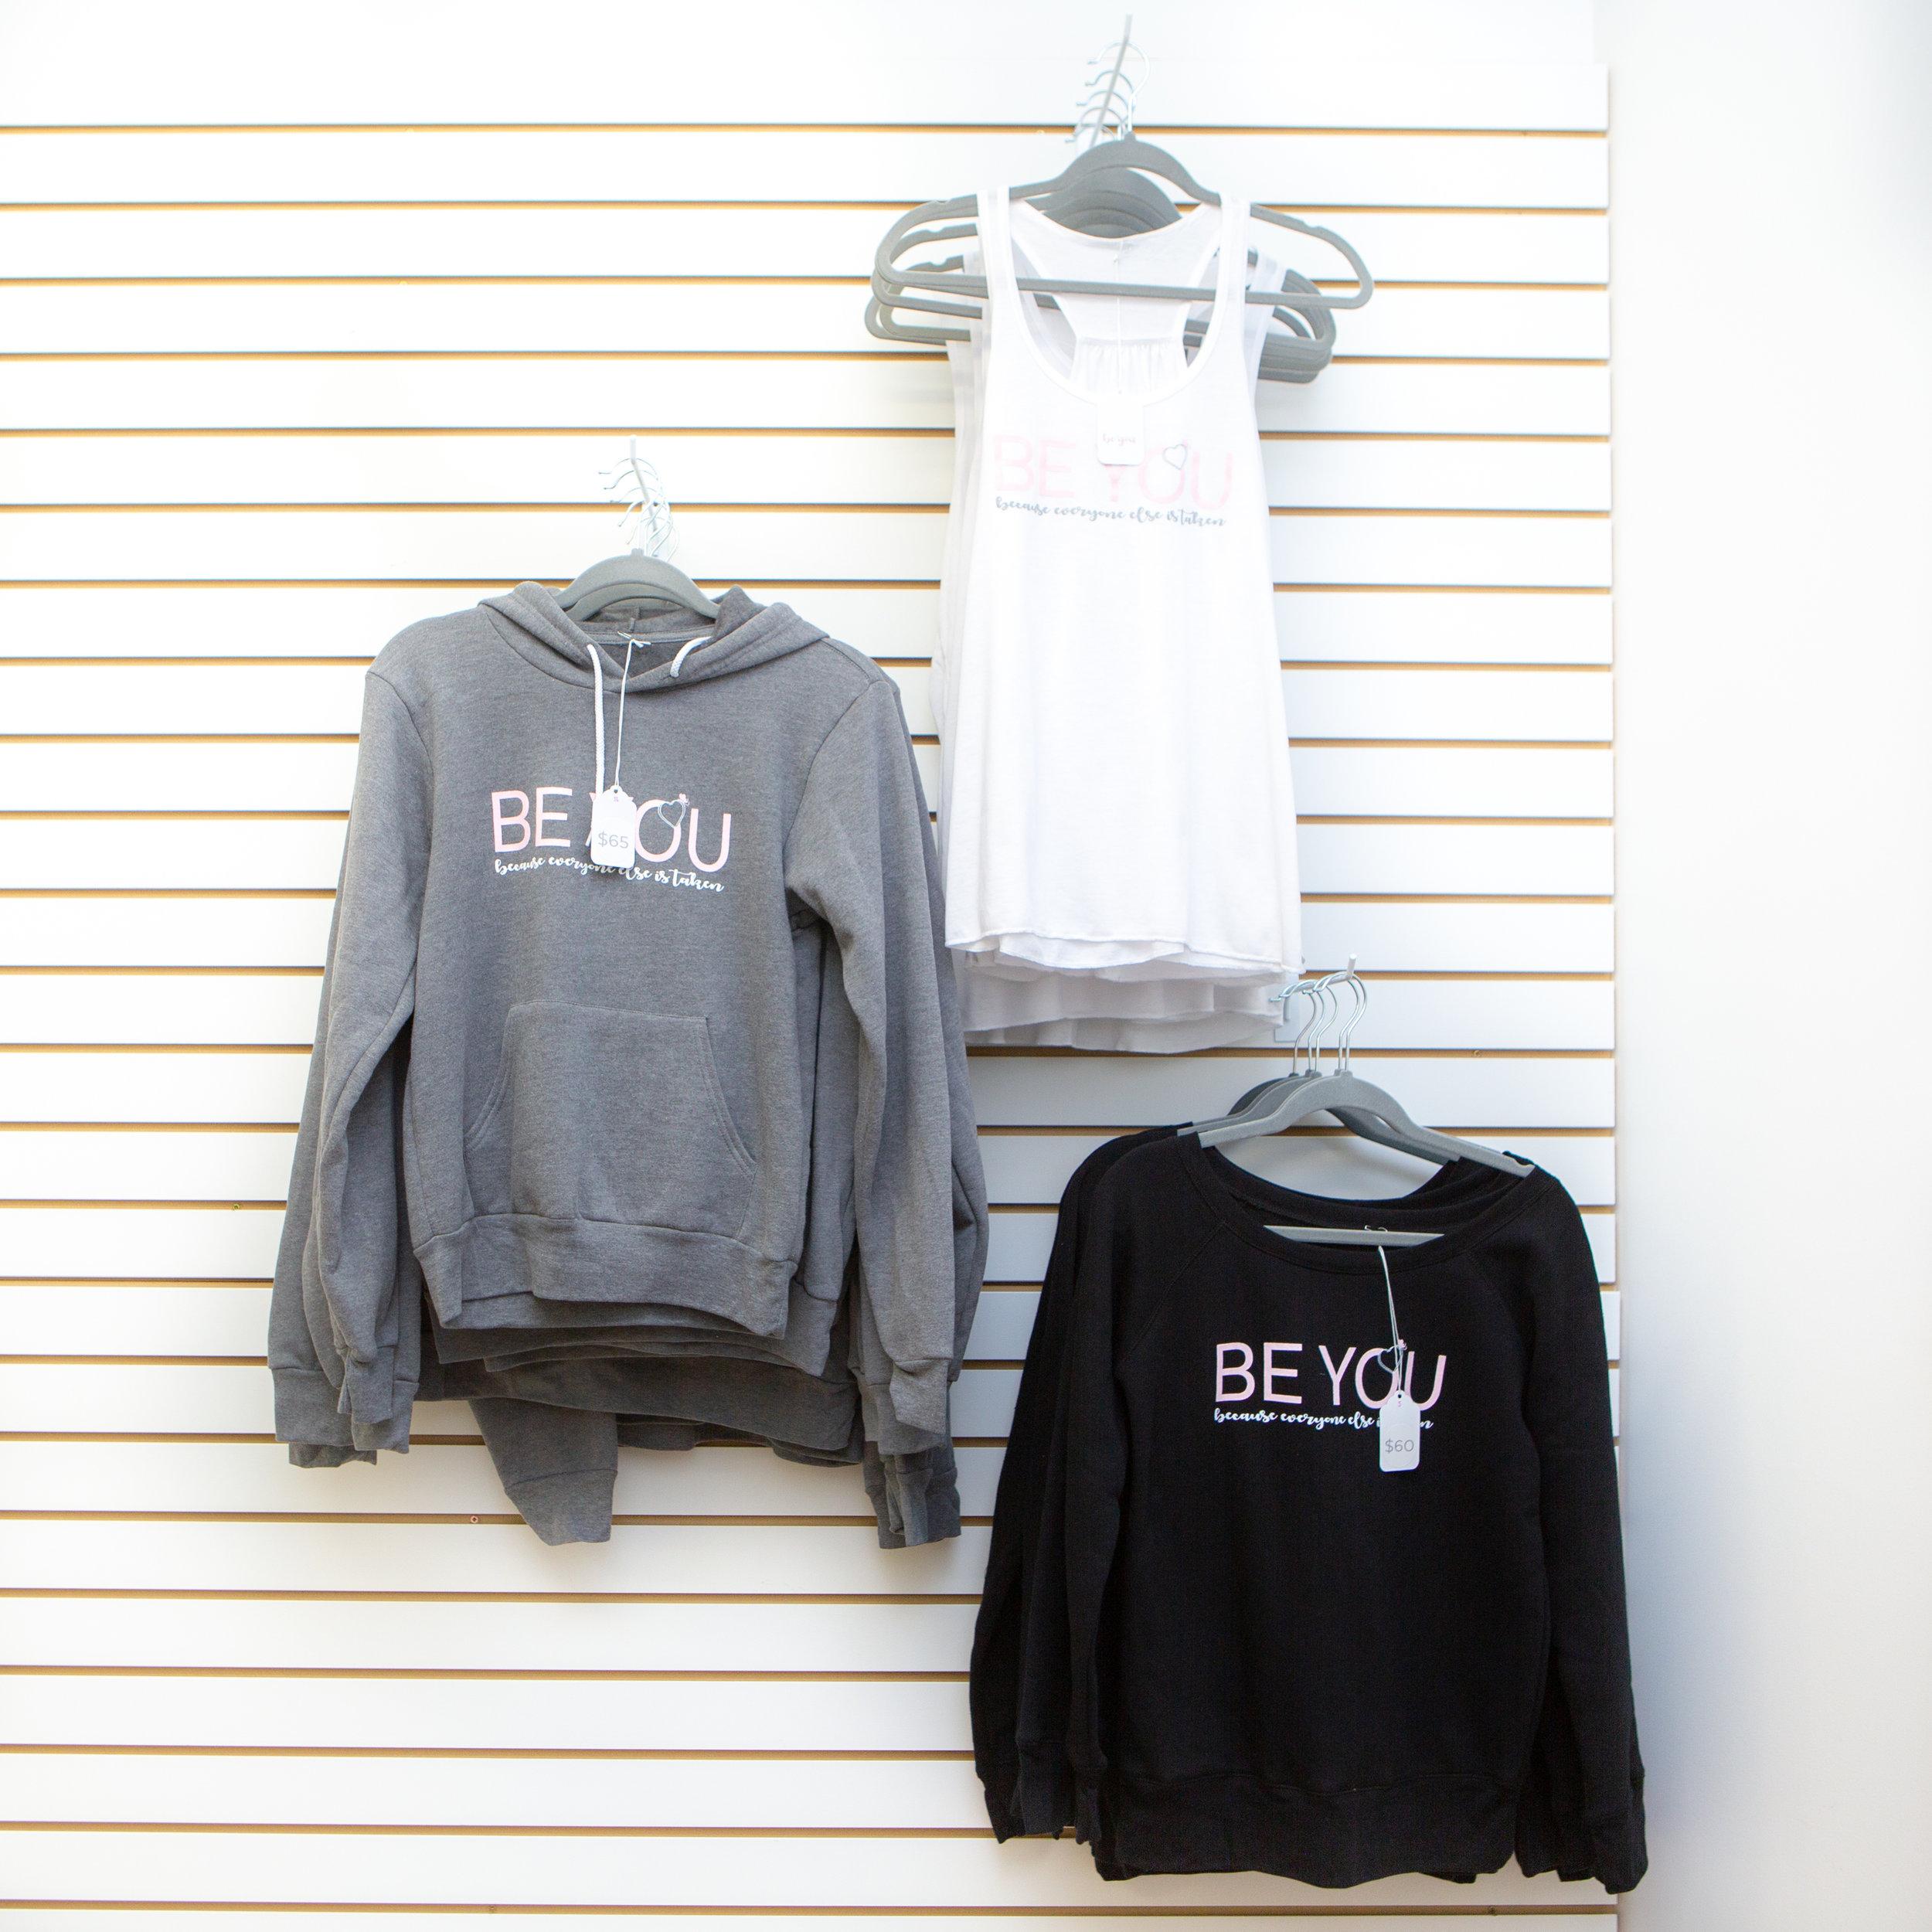 Edmonton Clothing Boutique 017.jpg